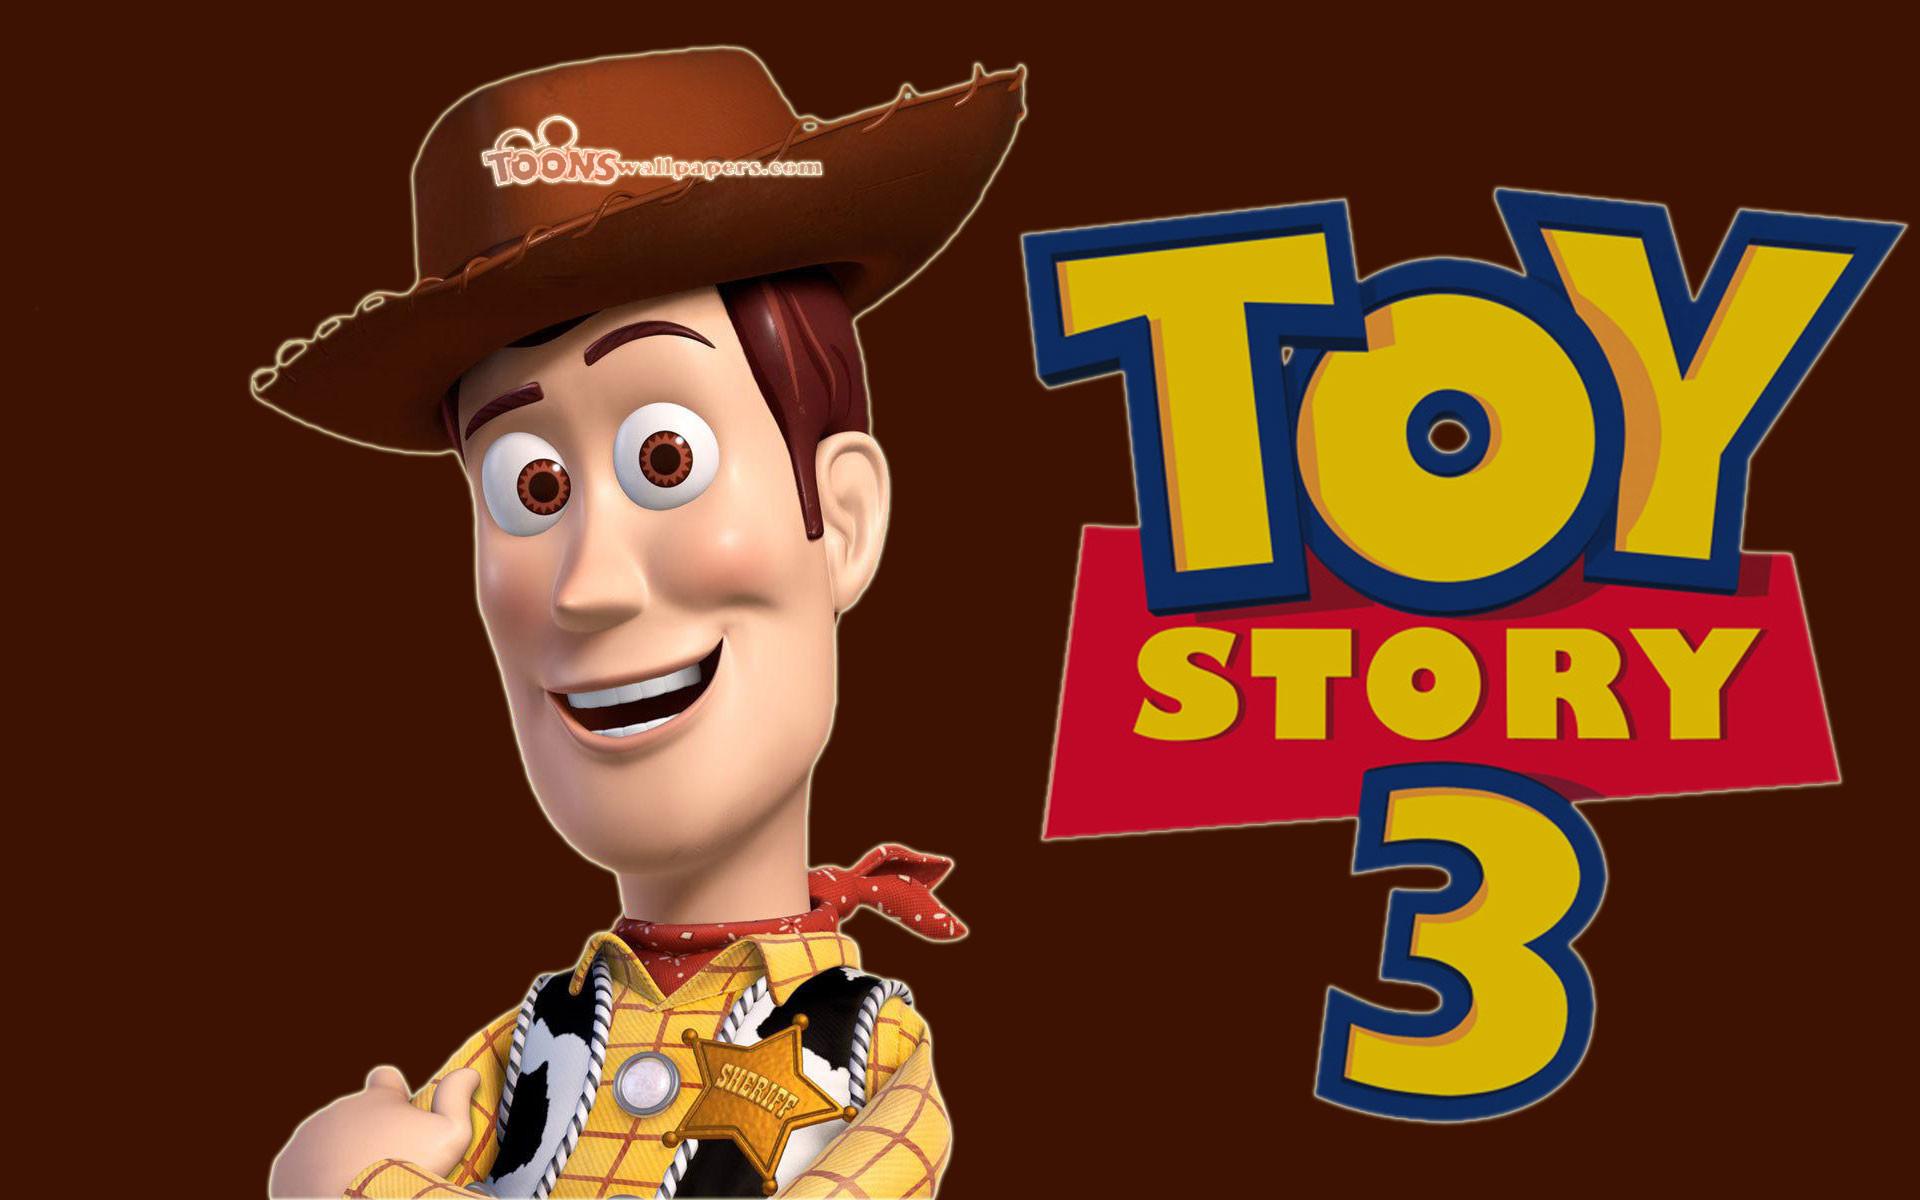 Toy Story Wallpaper for Desktop (55+ images)